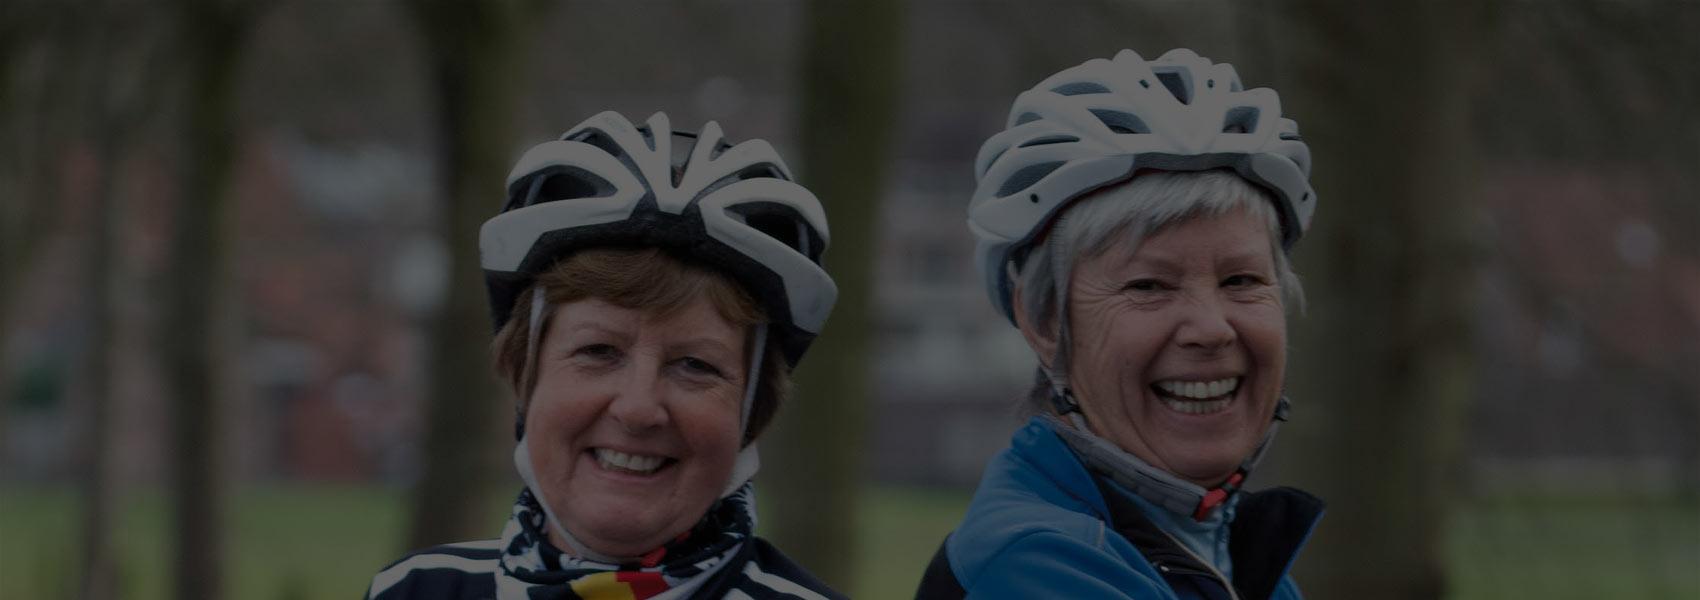 sliders-dames-fiets